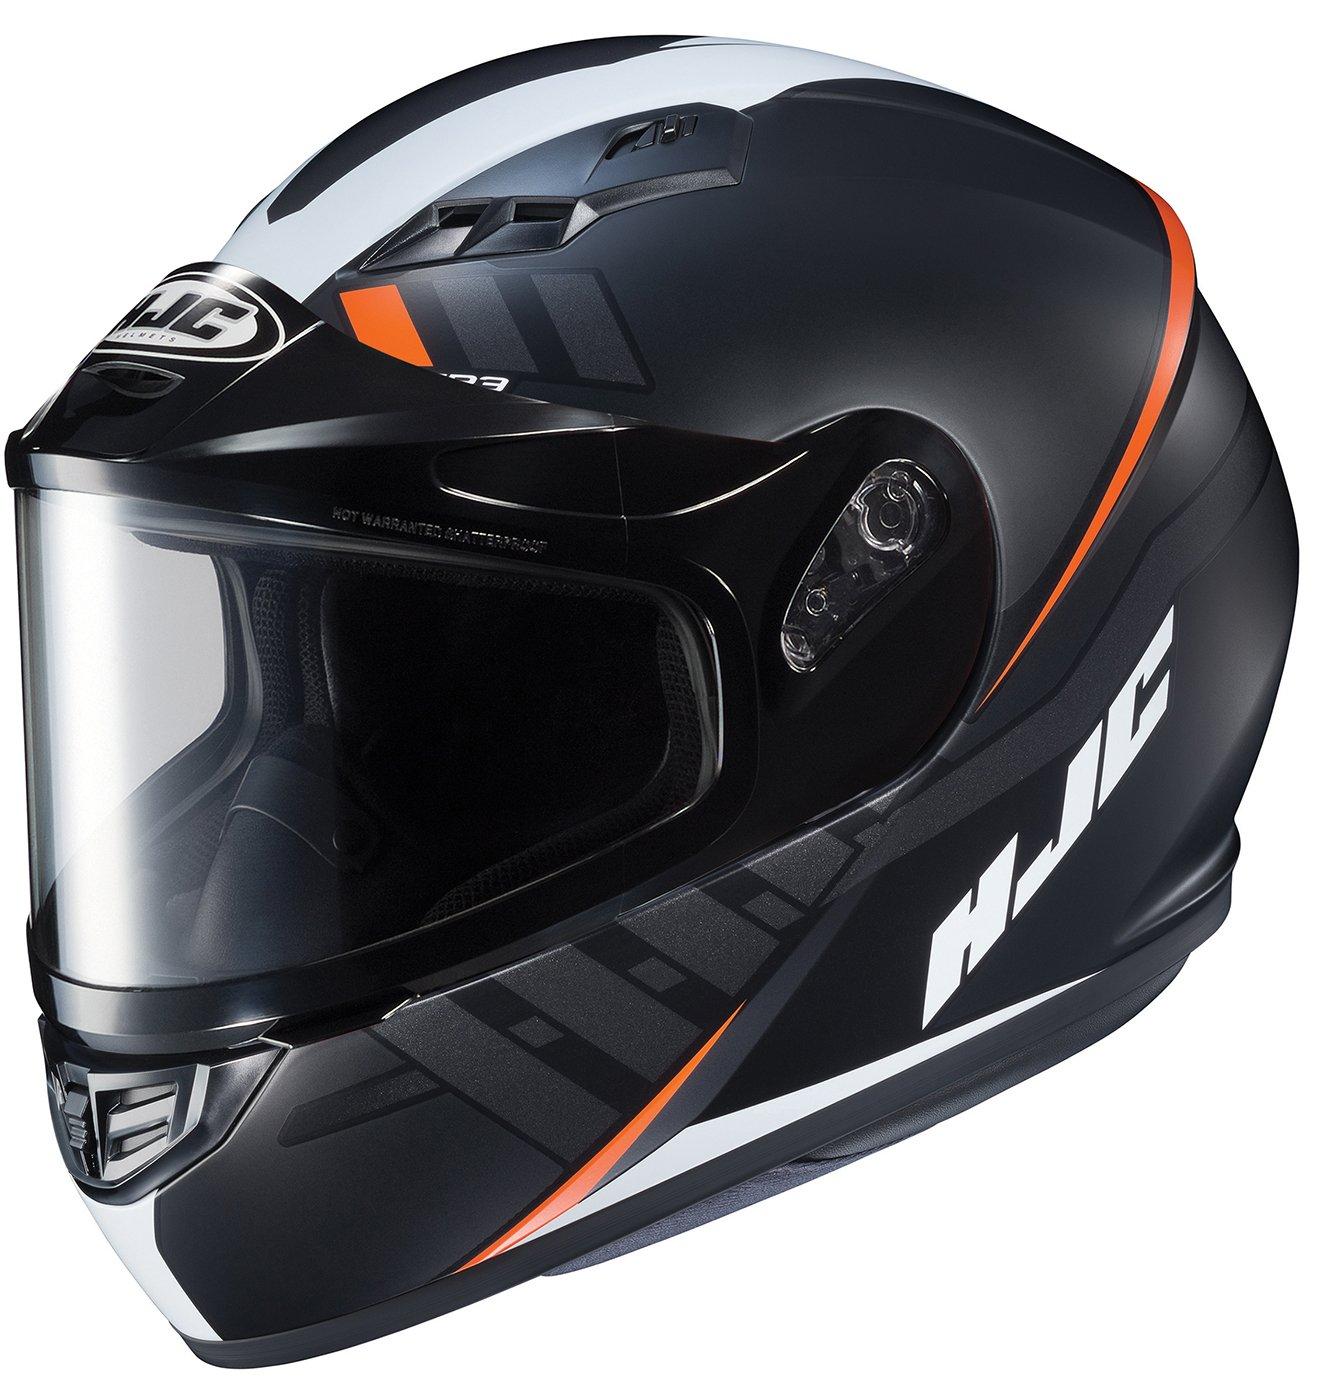 HJC Helmets Unisex-Adult Full-face Style CS-R3 Space Snow Helmet with Dual Lens Shield Black//Orange X-Large 137-775